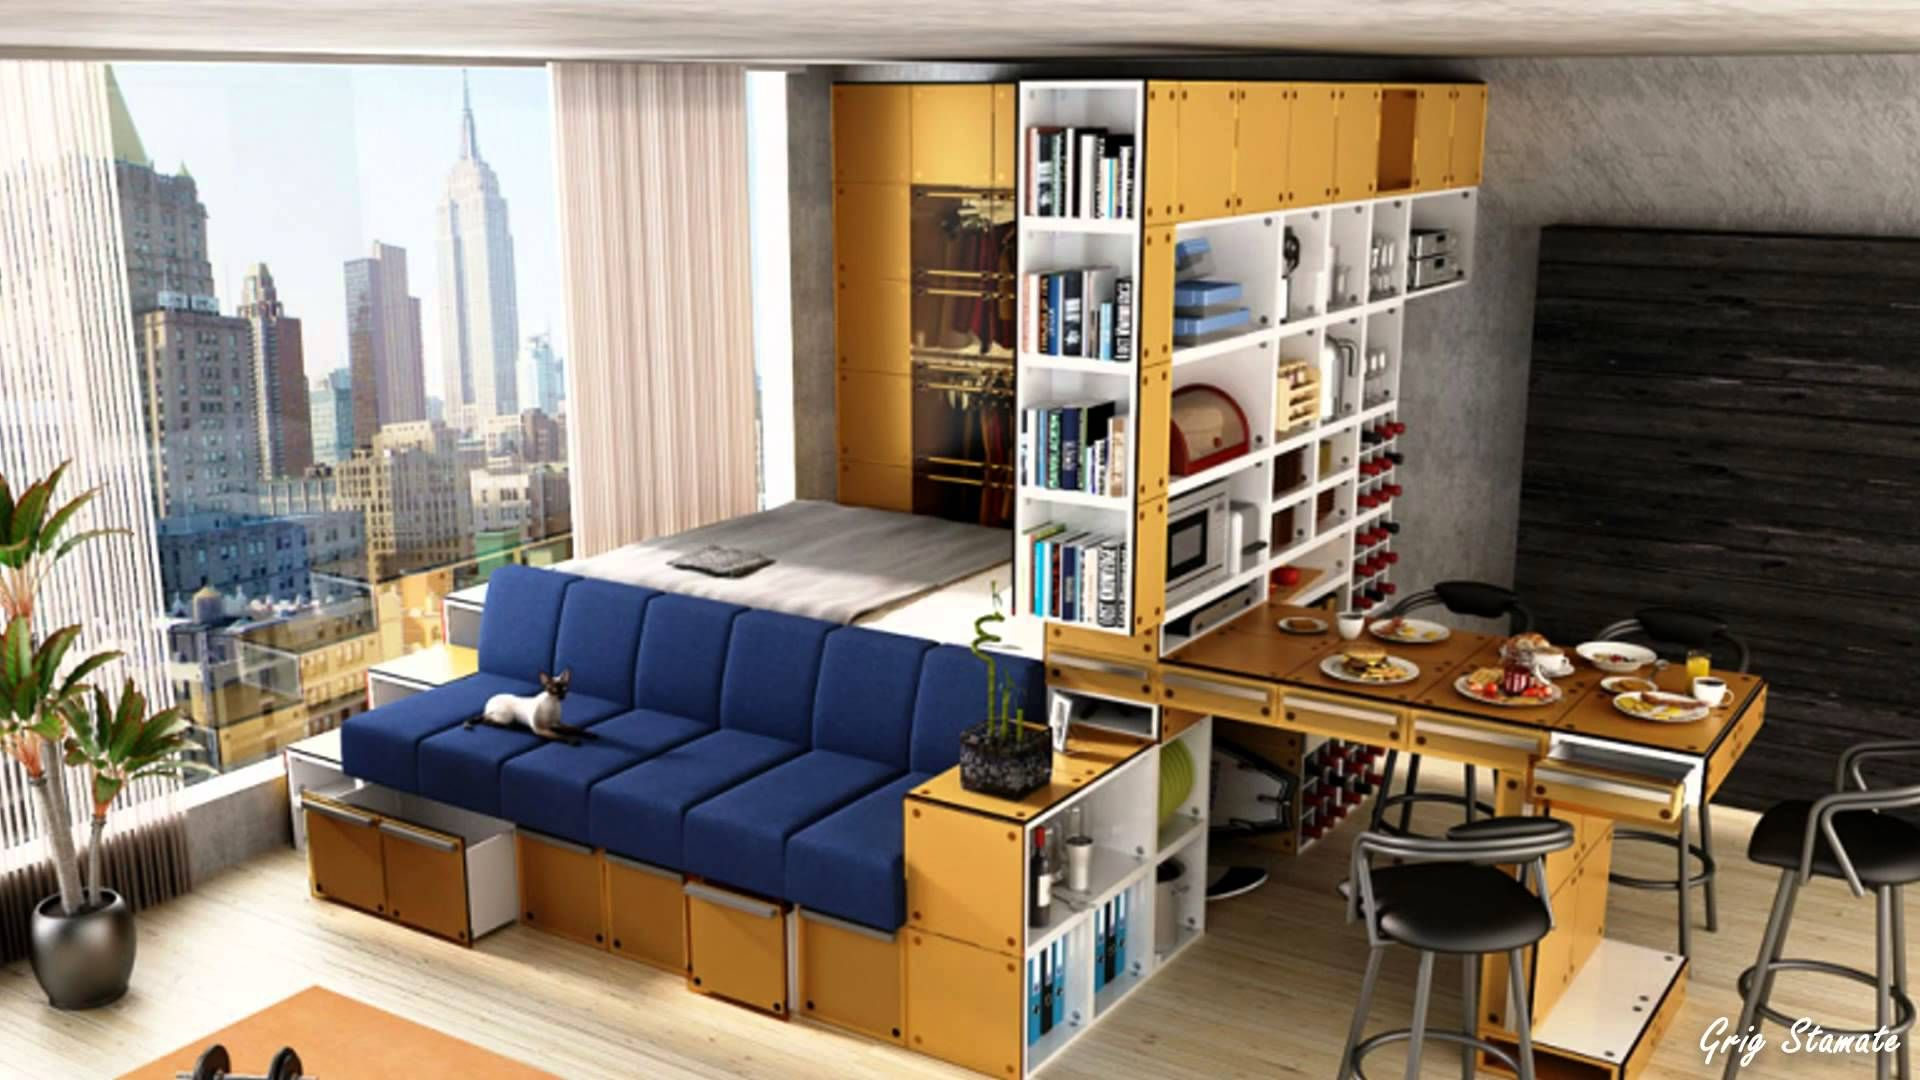 Studio apartment ideas home decor and design ideas pinterest